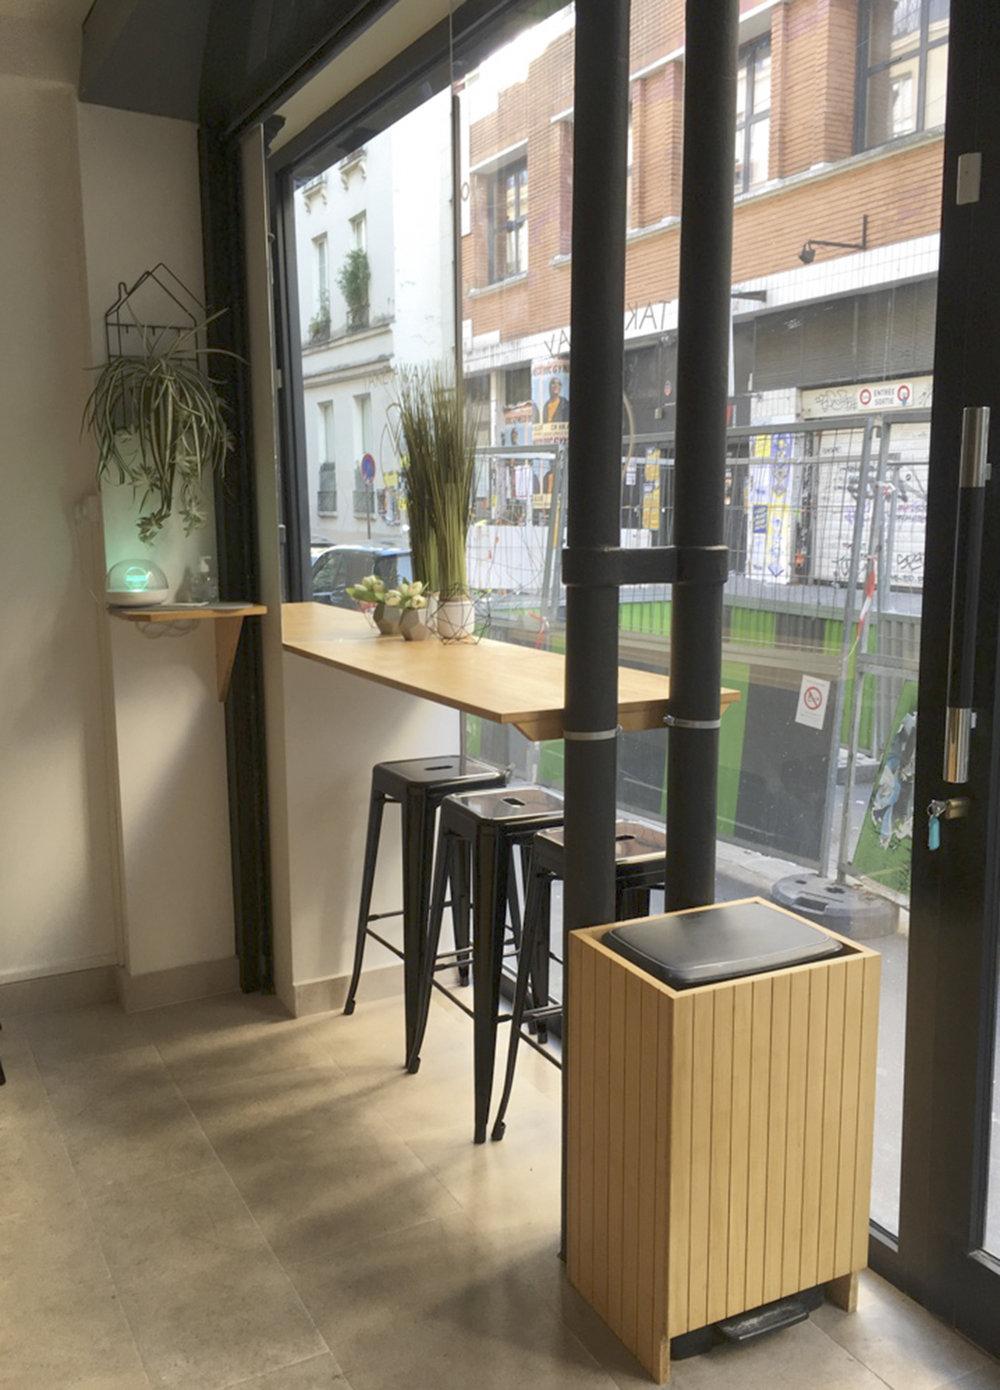 carreplie-interior-design-restaurant-pallapizza-3.jpg